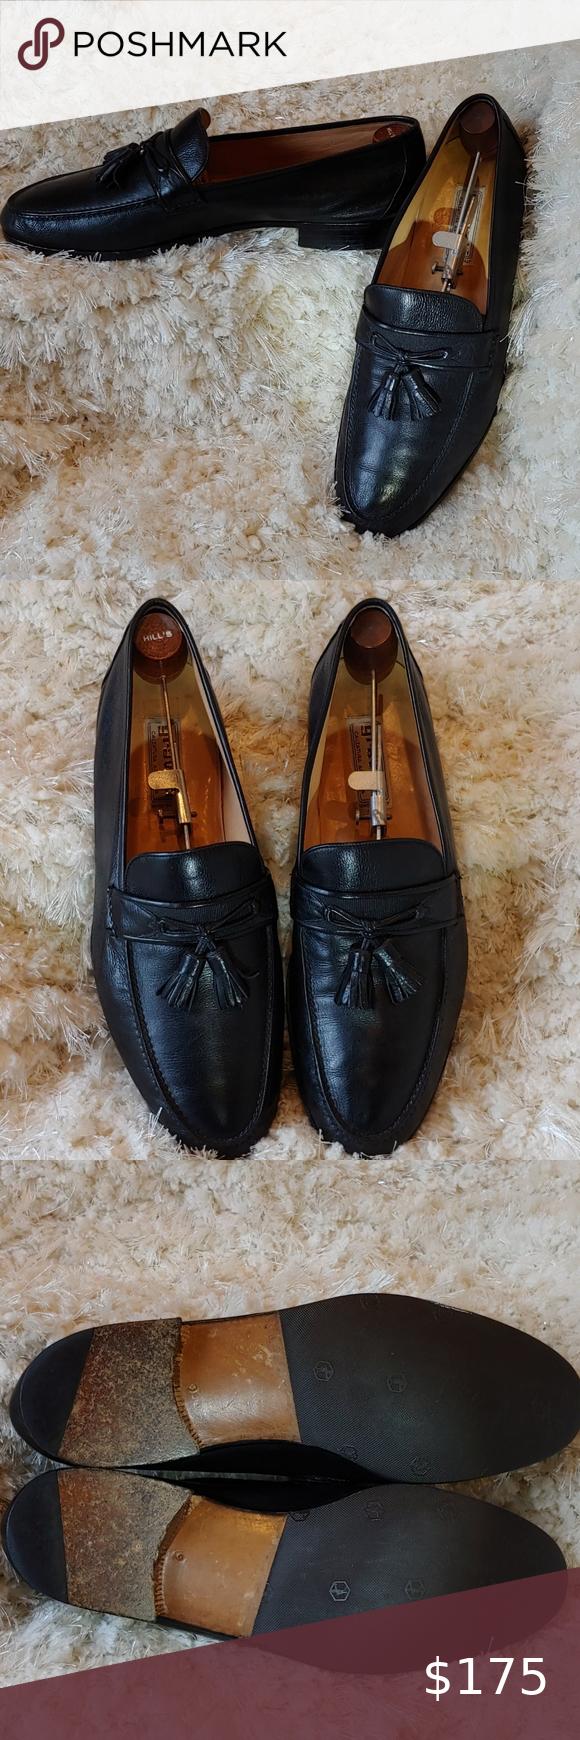 Gravati Black Butter Soft Leather